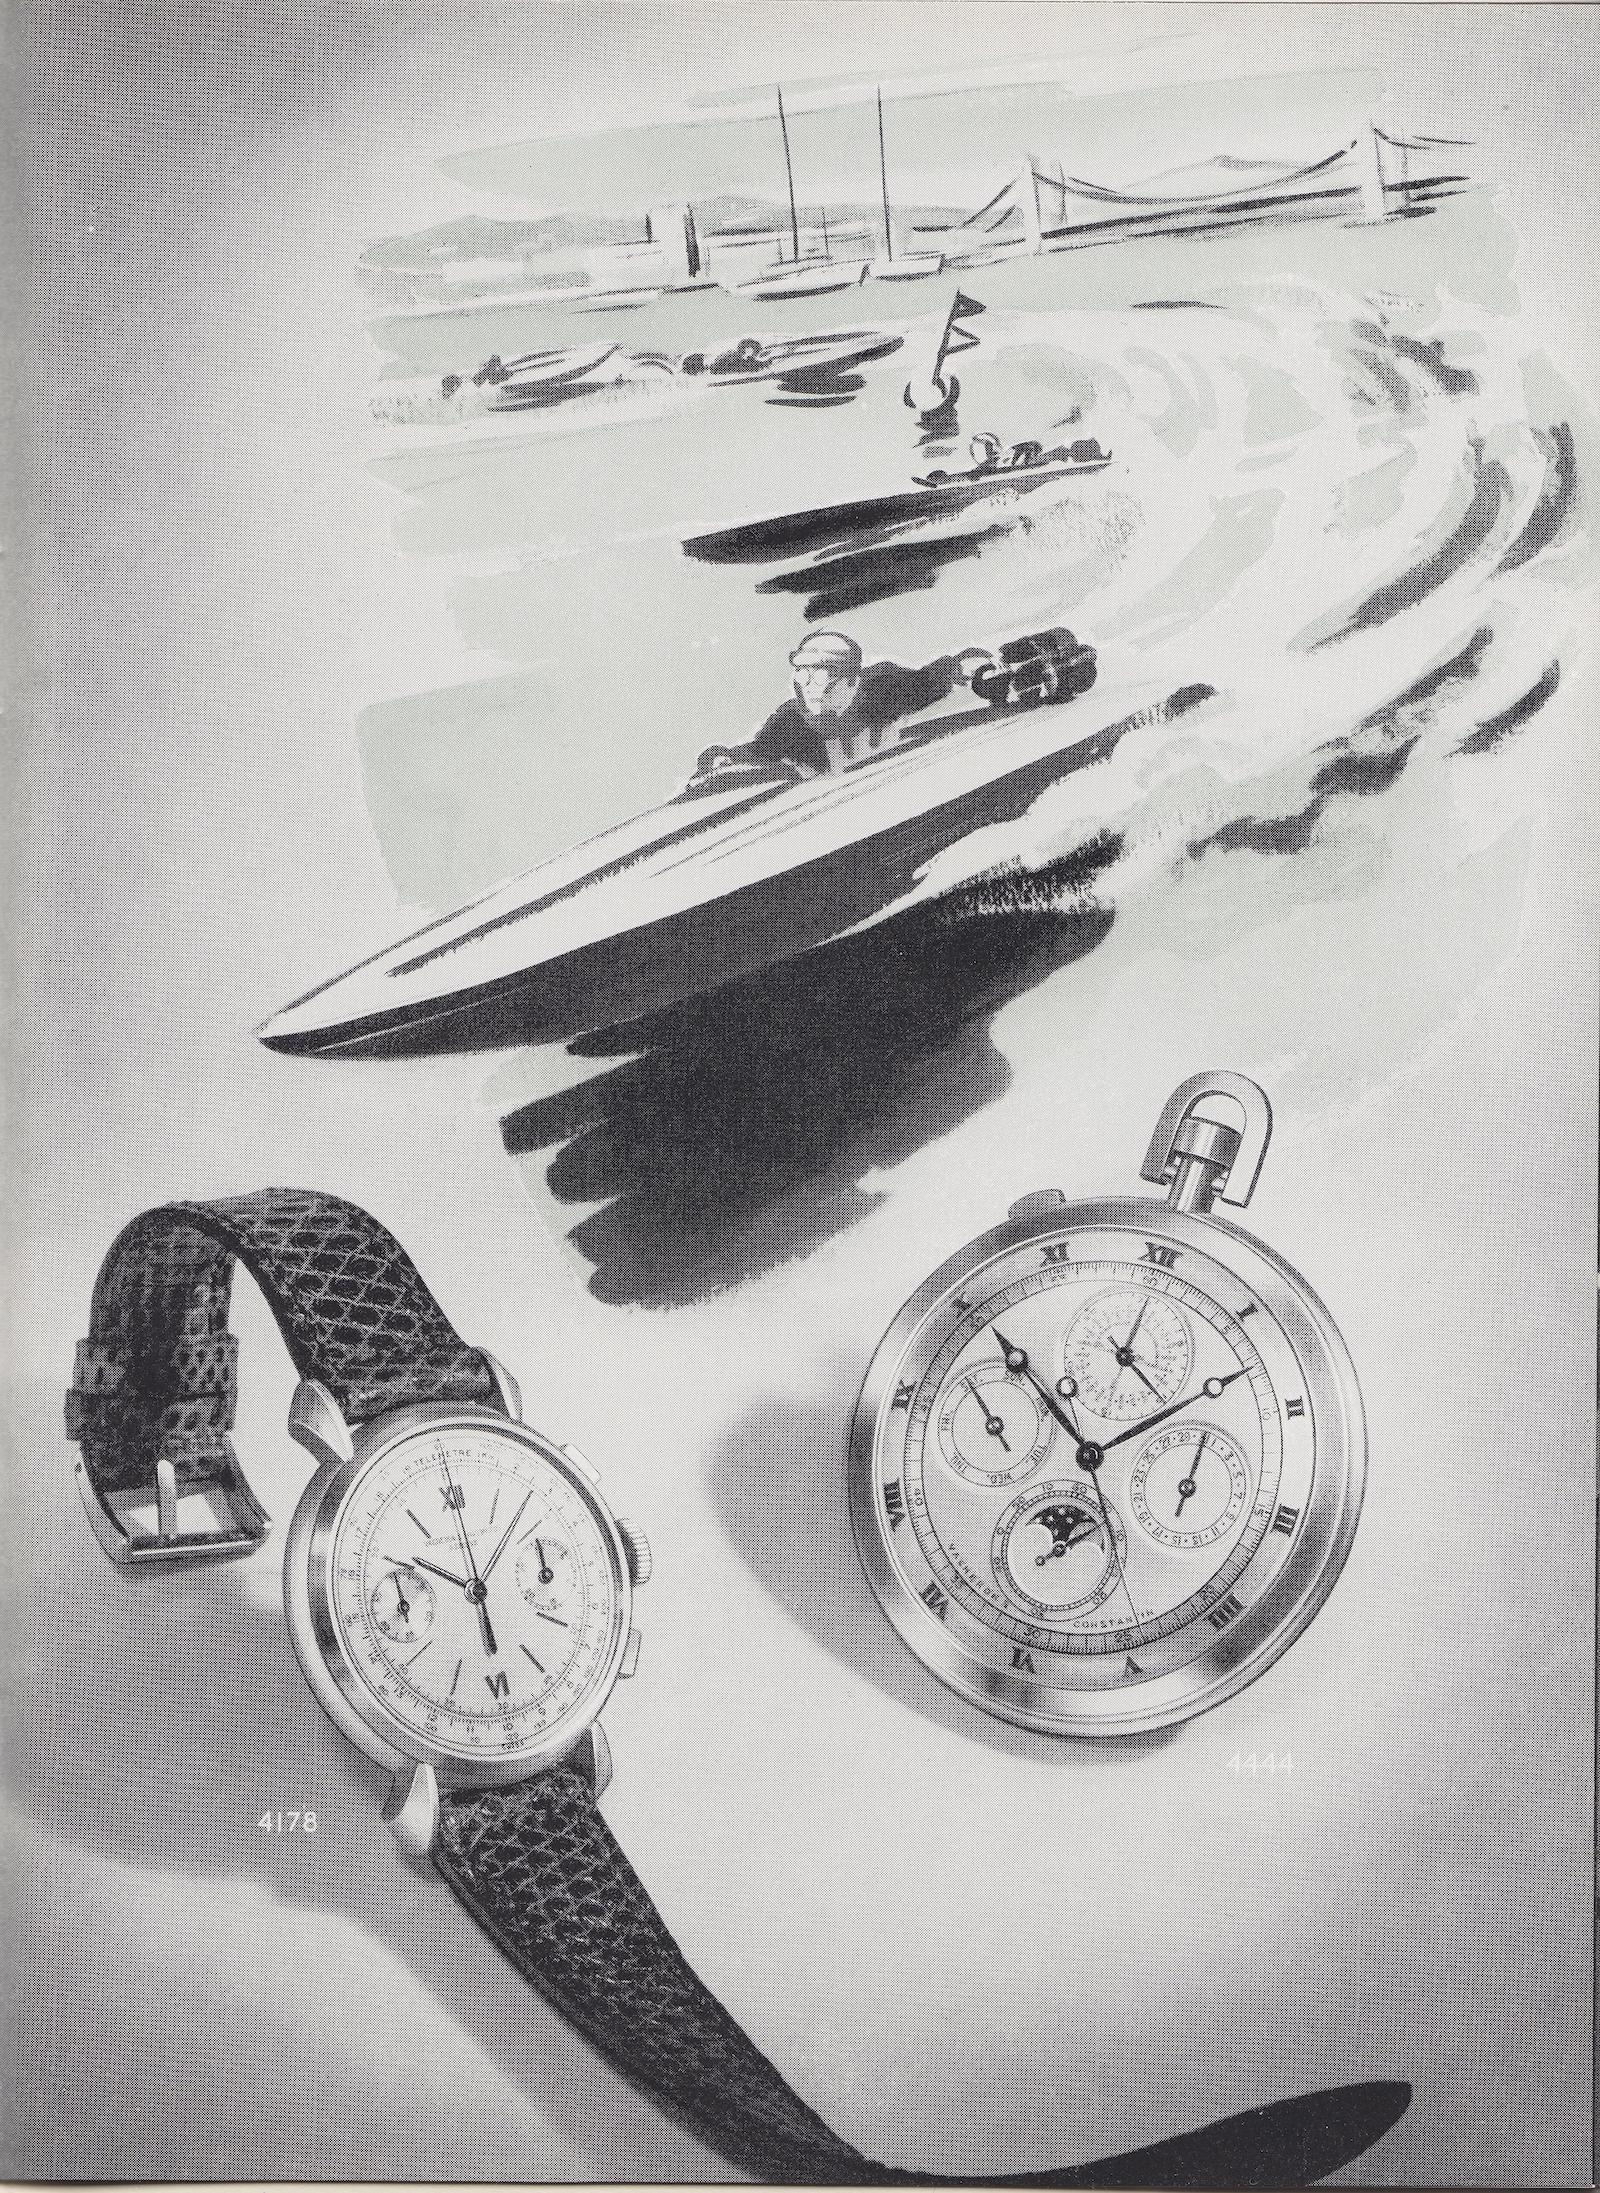 Vacheron Constantin Cornes de Vache Chronograph vintage advert - 3